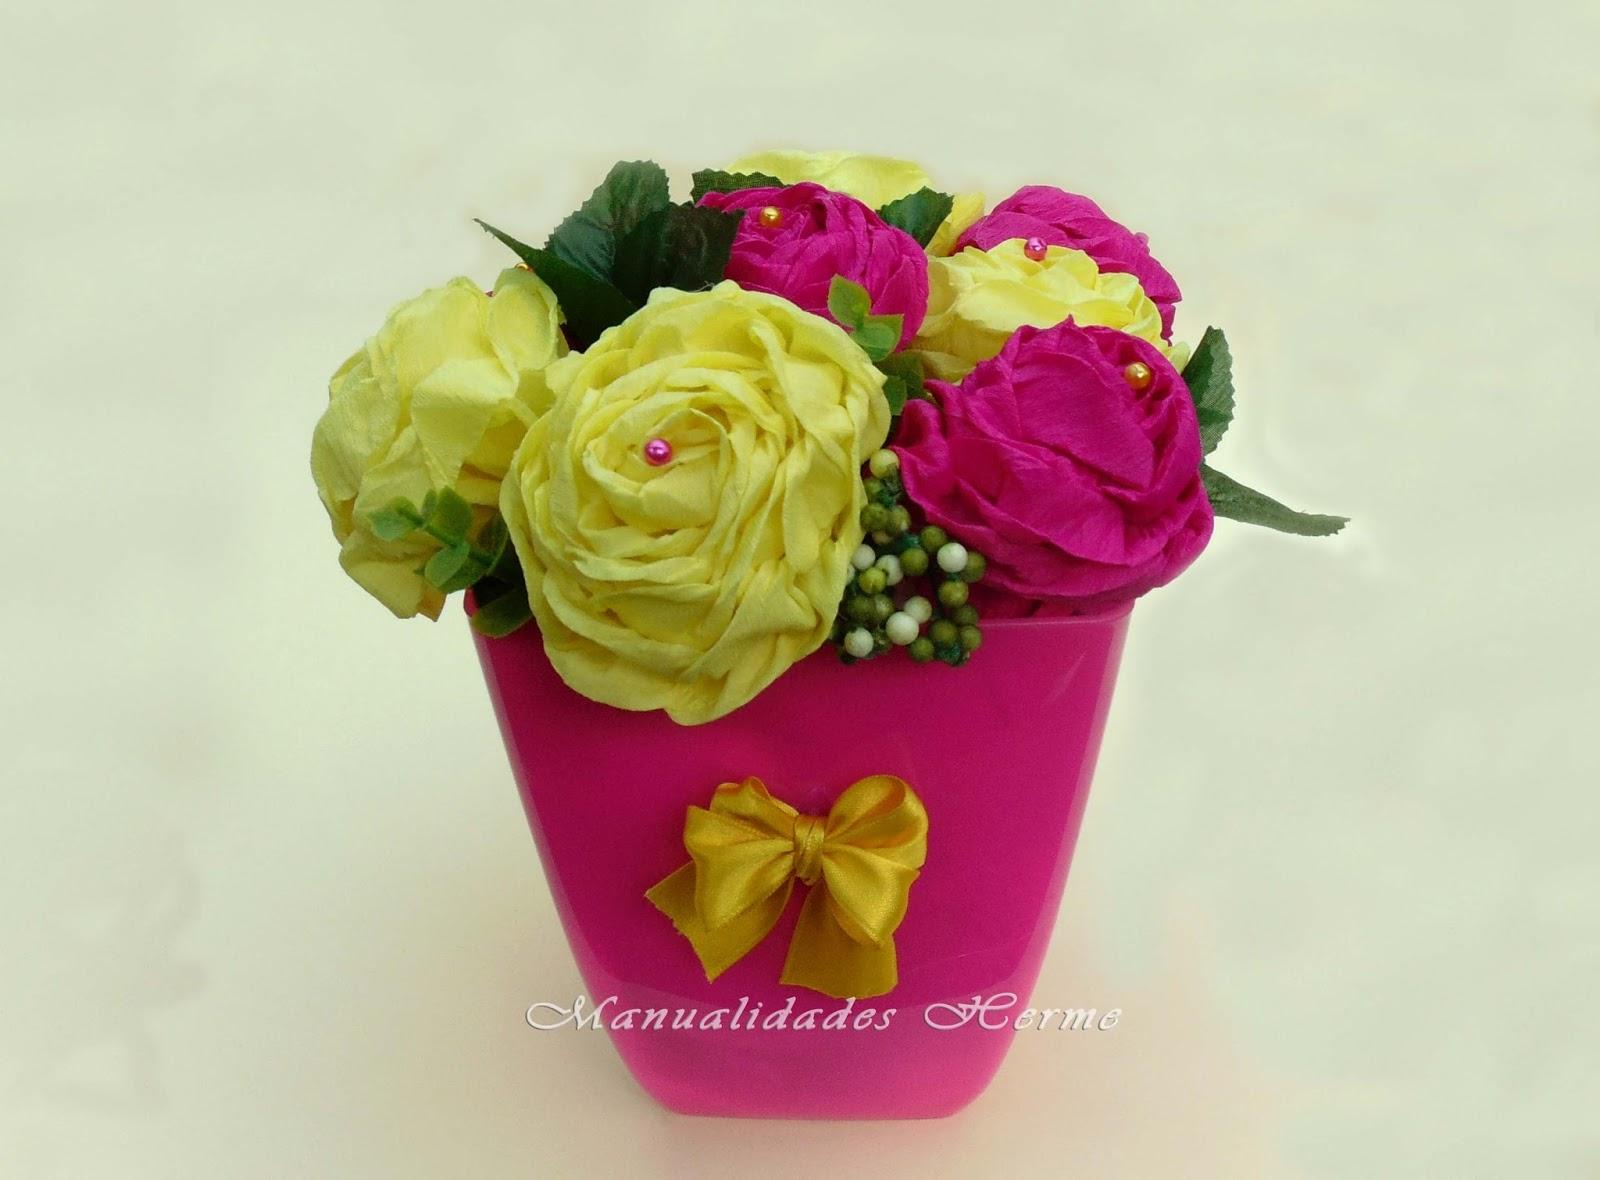 Manualidades Herme Como Hacer Rosas De Papel Crepe